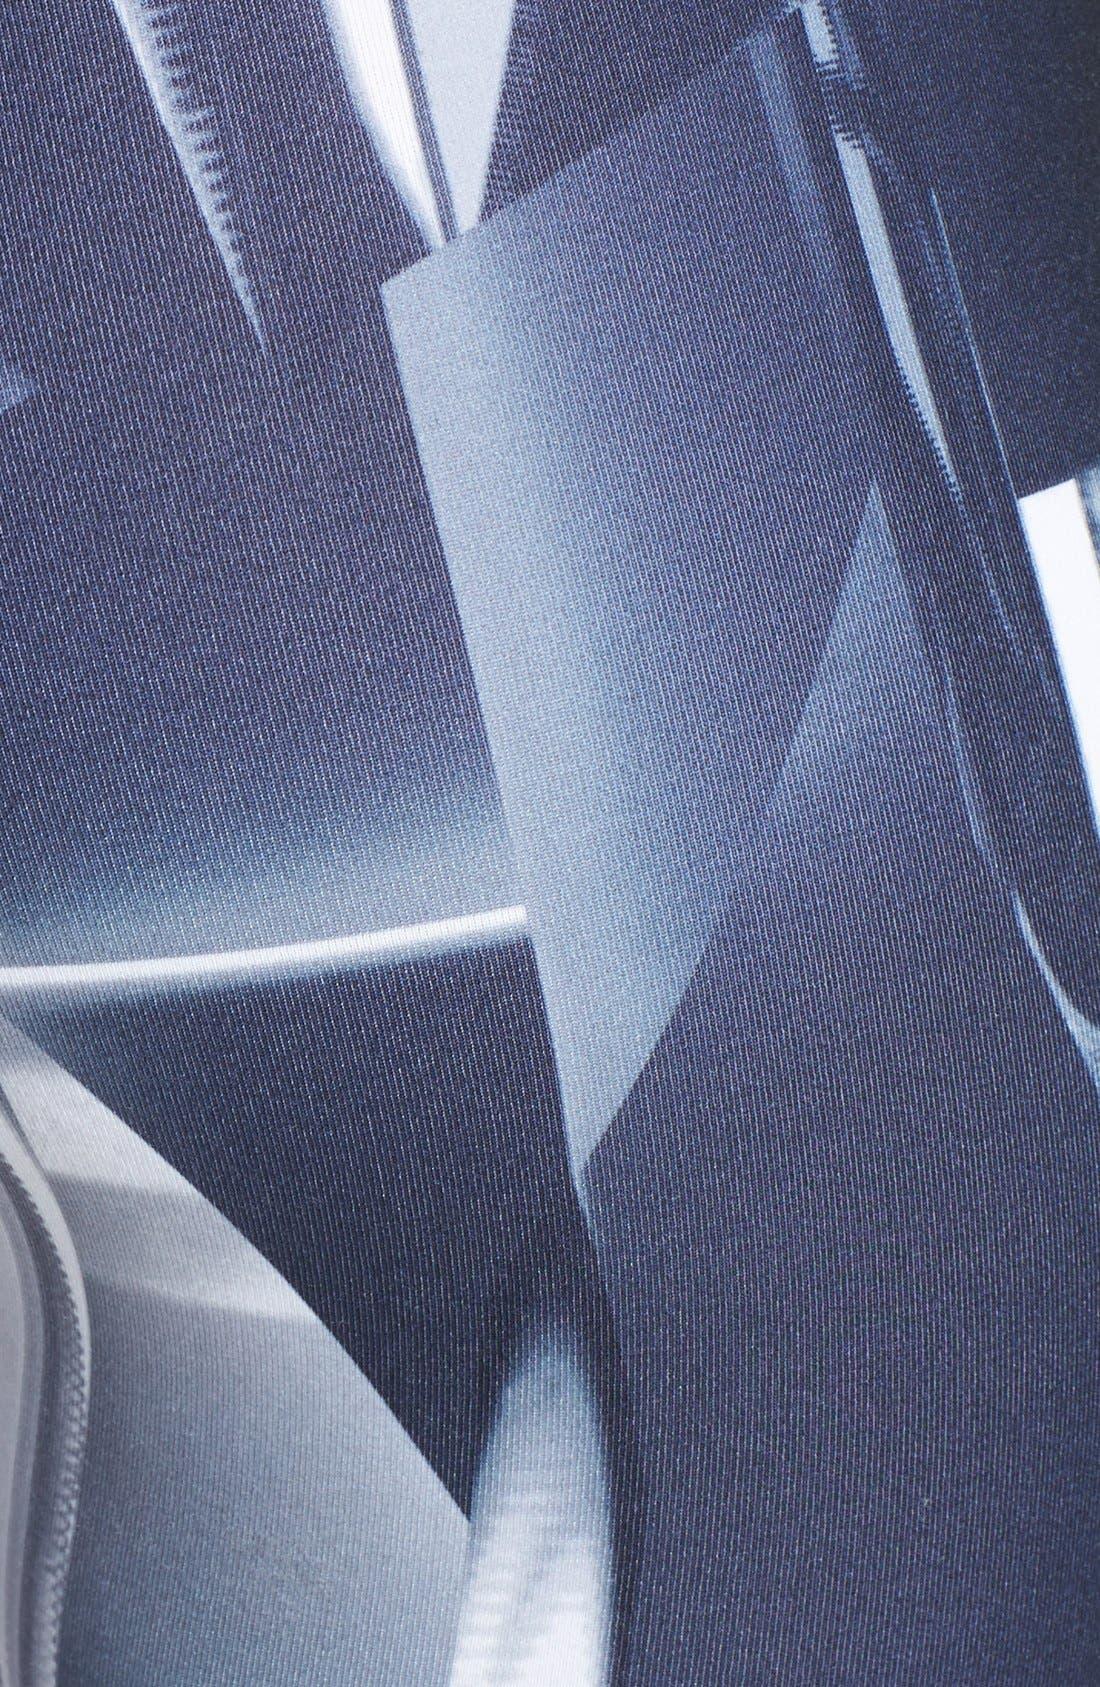 Alternate Image 4  - Alo 'Goddess' Strappy Sports Bra